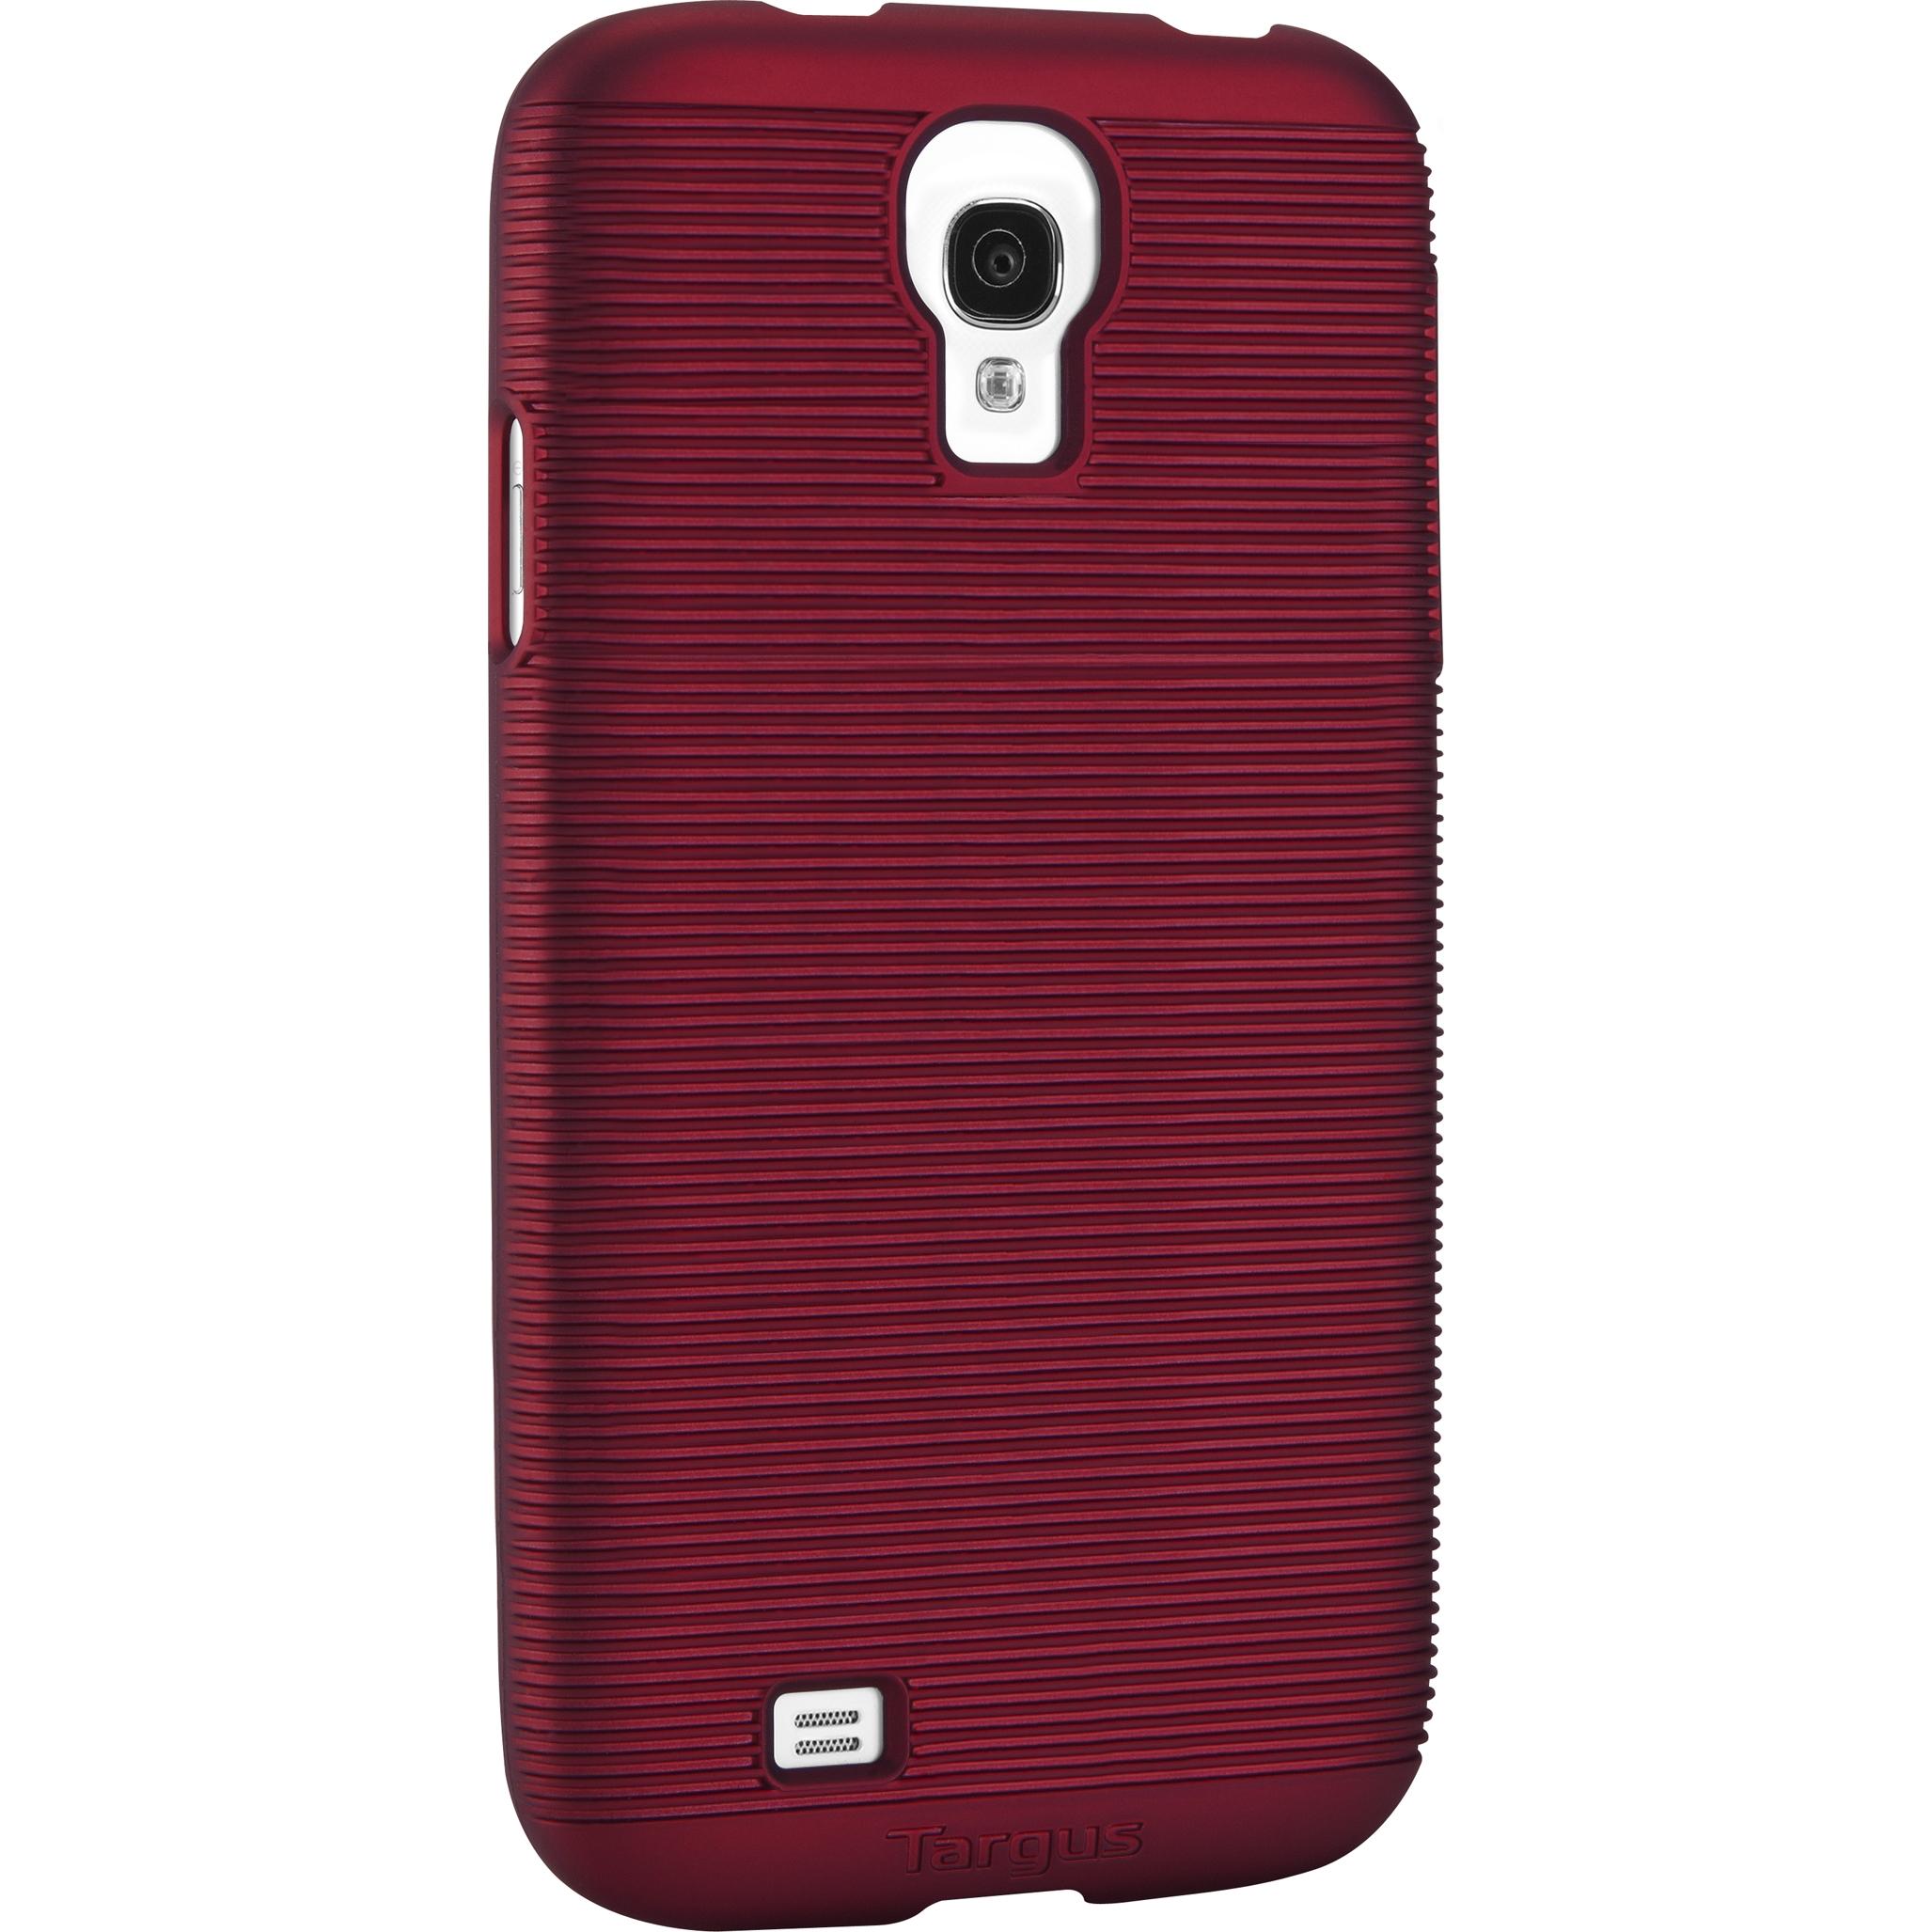 TARGUS Smartphone case Samsung S4 Slim Laser Rot crimson